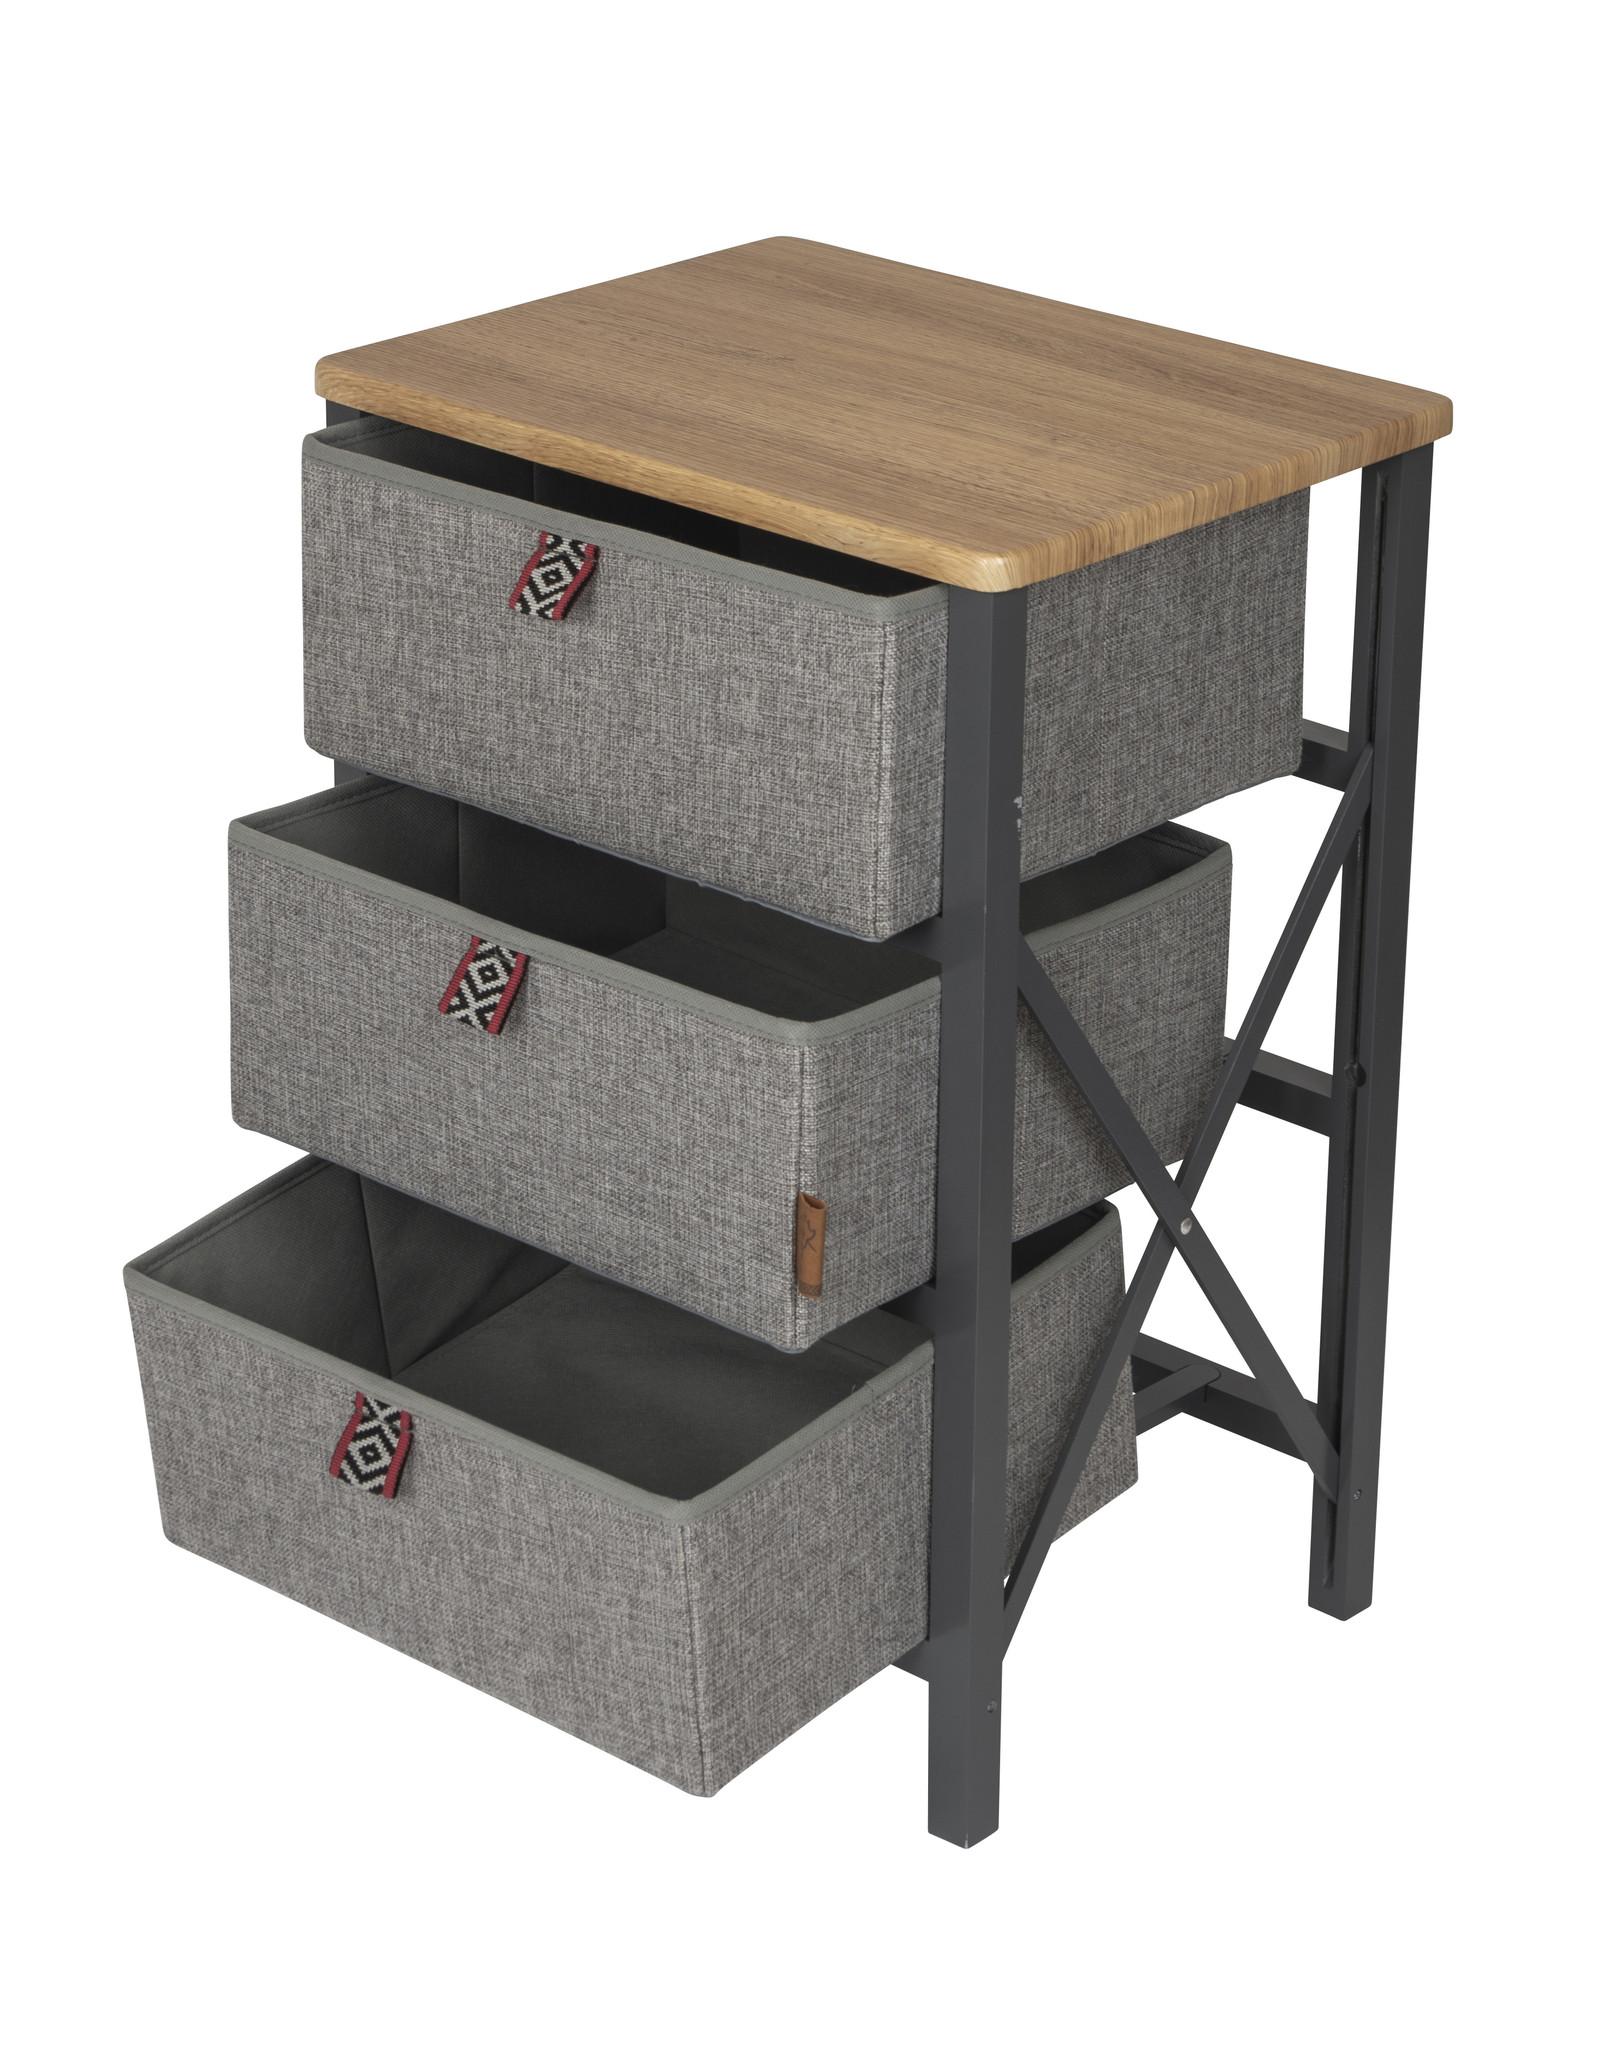 Bo-Camp Hamlets  cabinet BoCamp Urban Collection